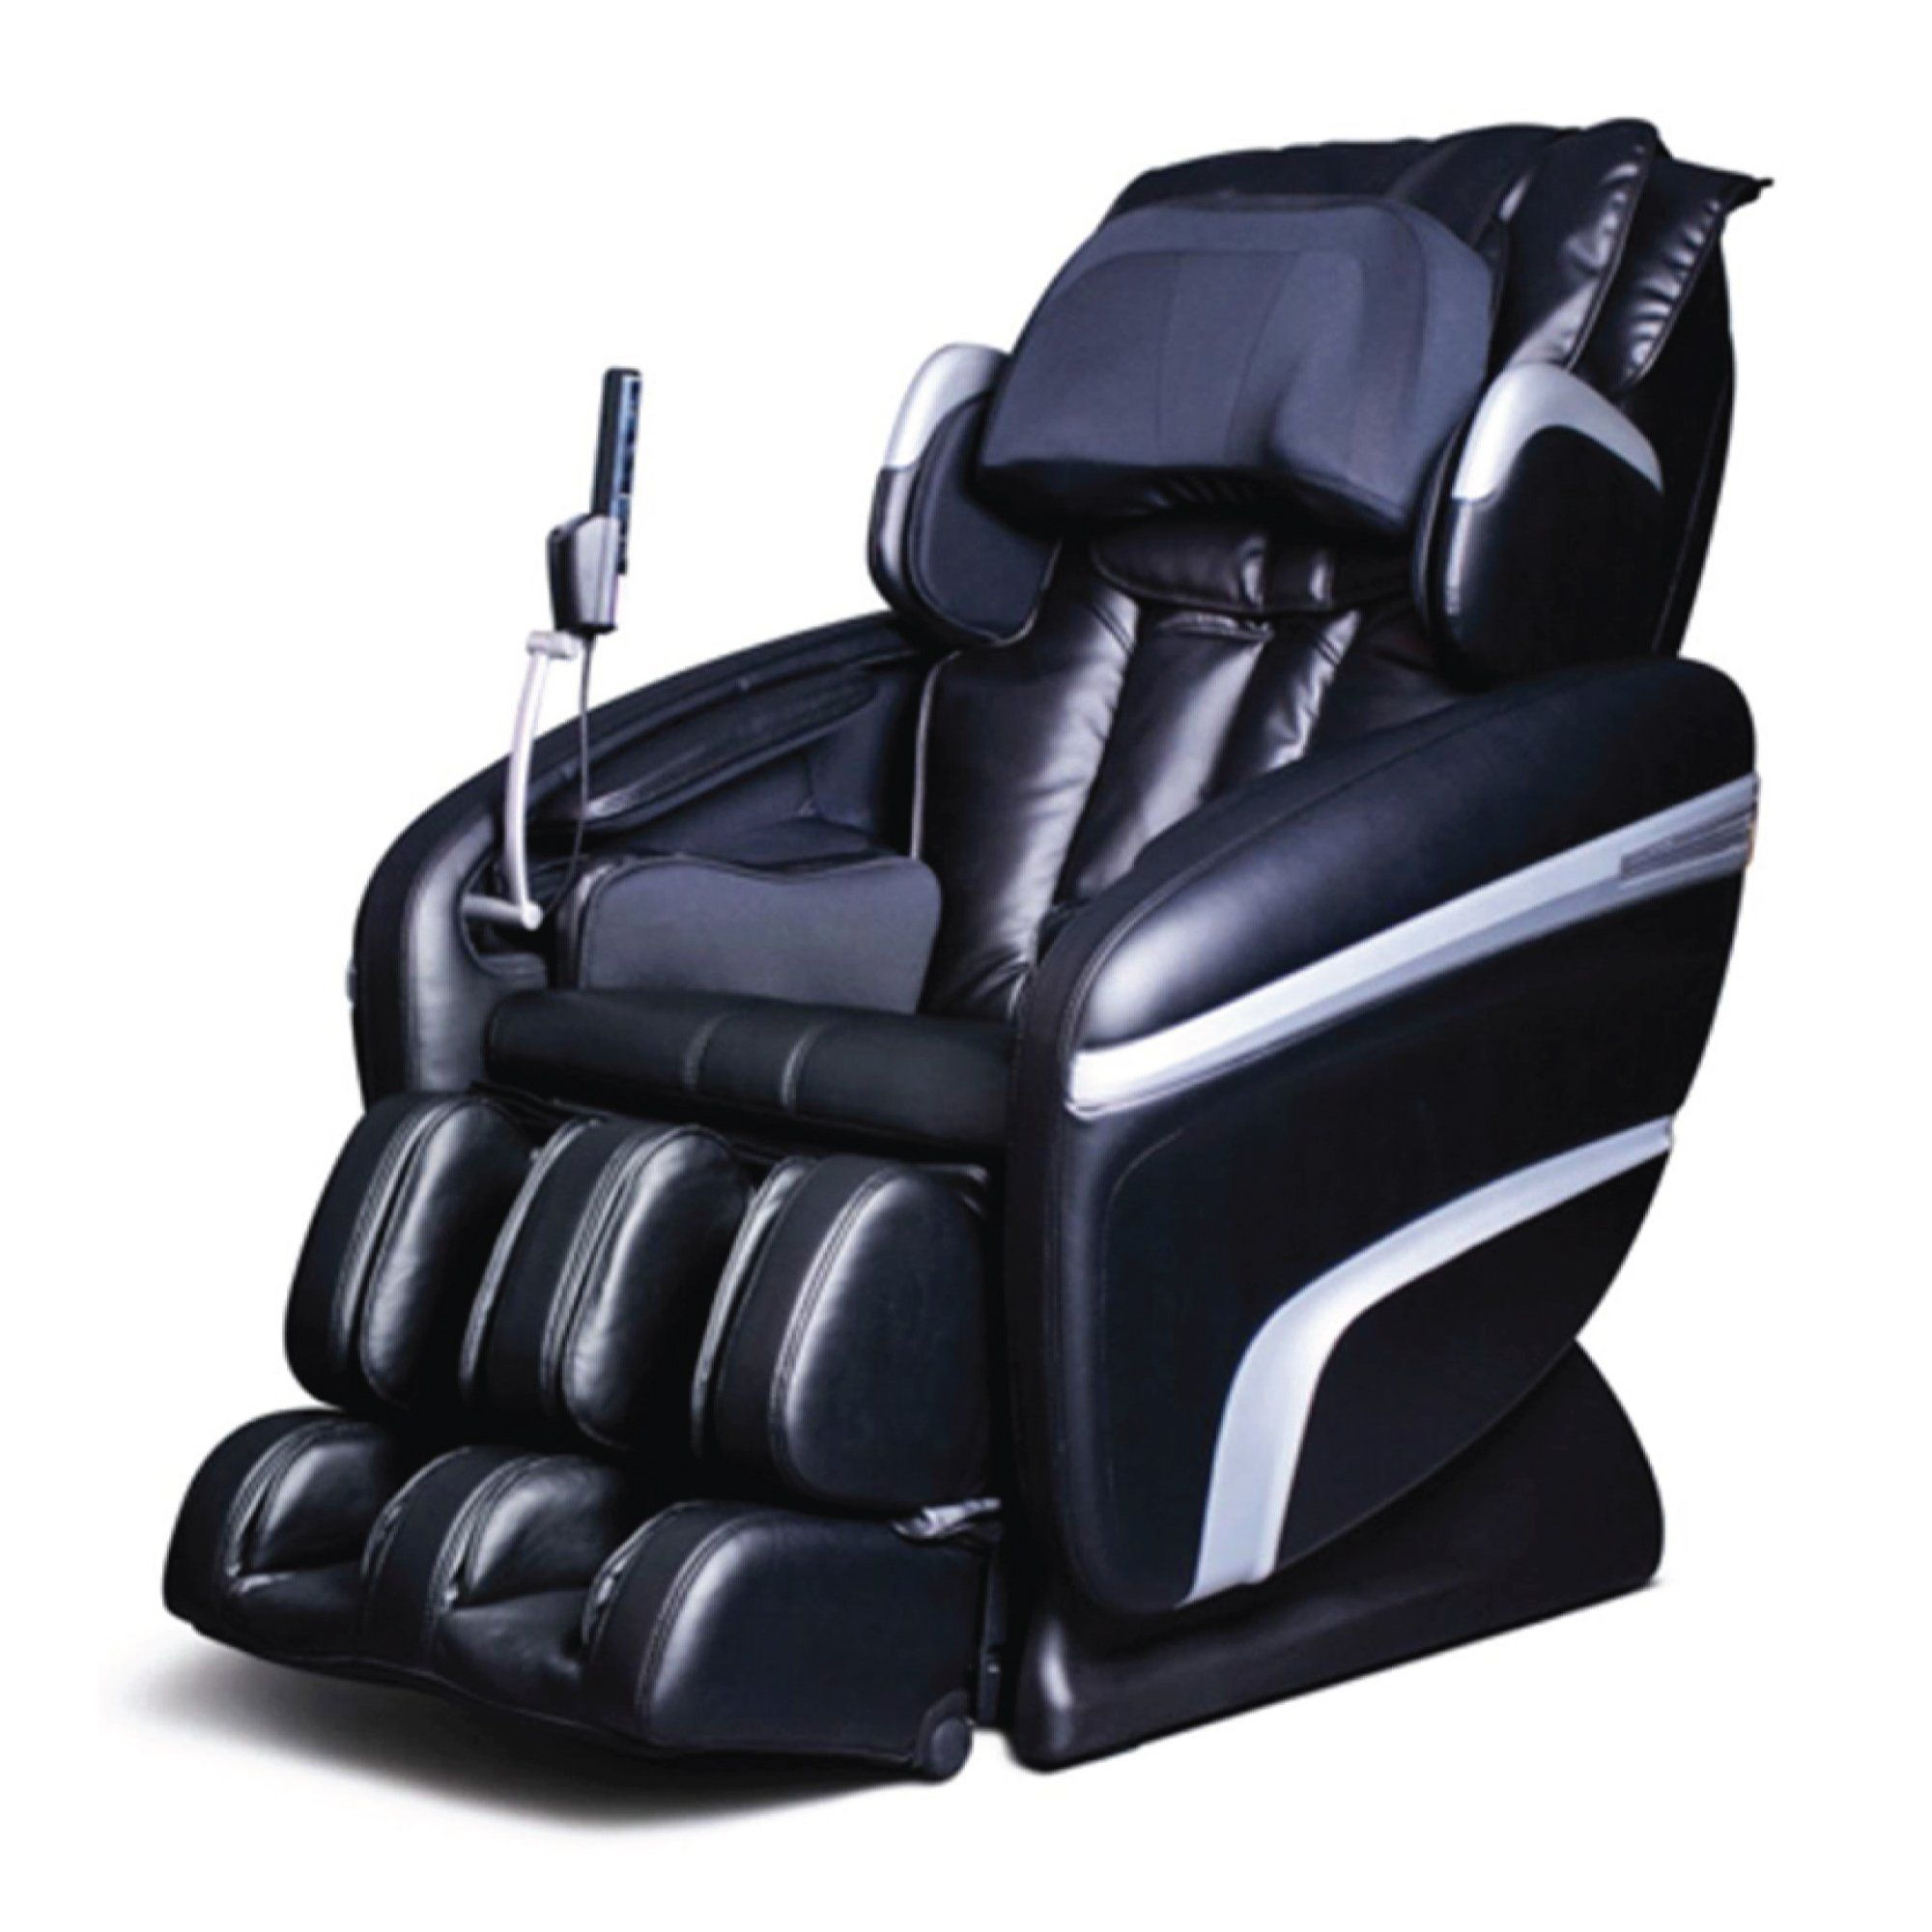 Osaki 7200H Zero Gravity Heated Massage Chair Massage